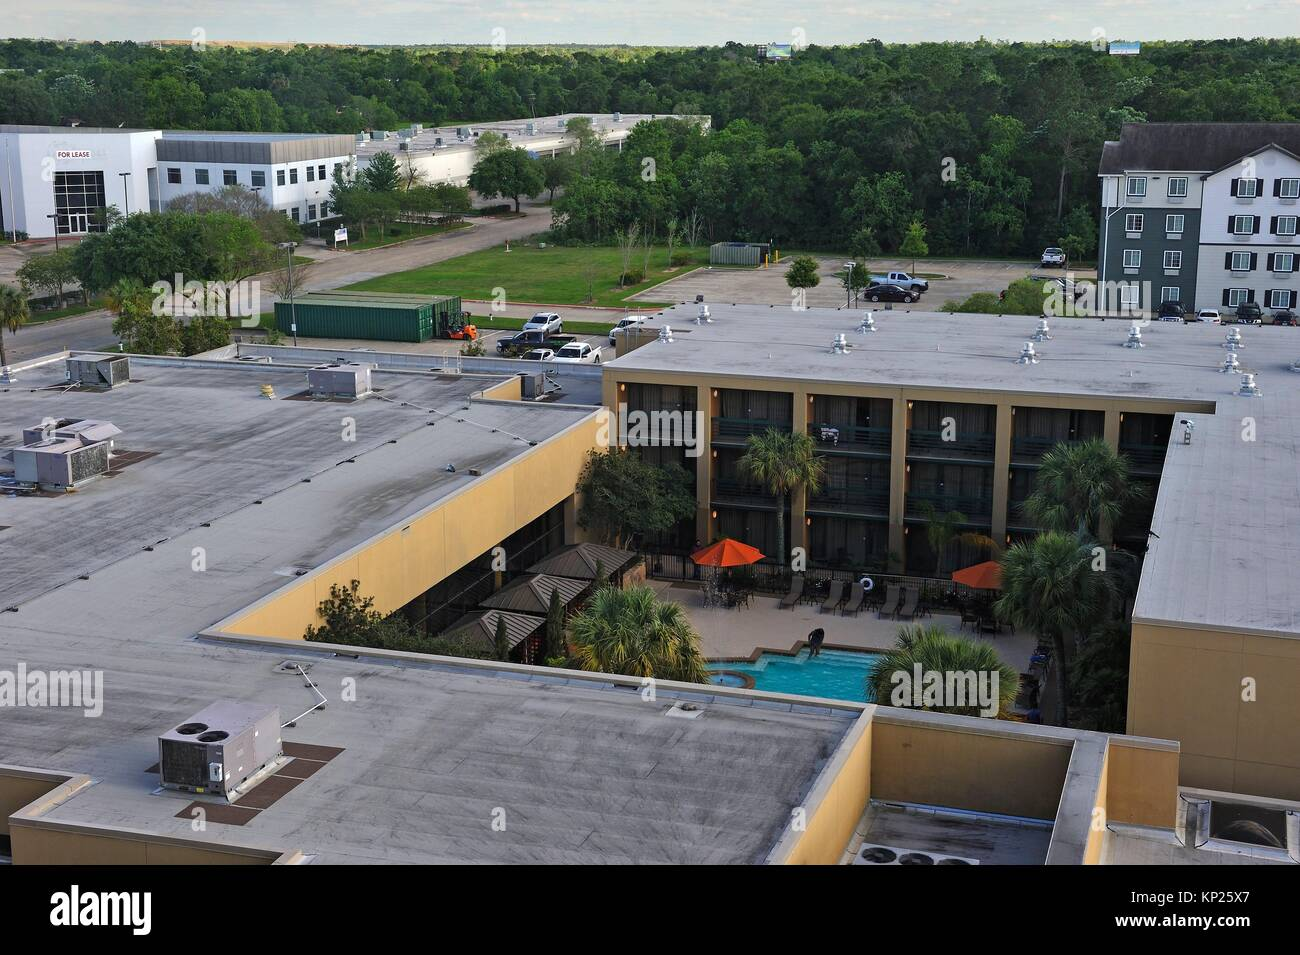 MCM Elegante Hotel, Beaumont, Texas, Stati Uniti d'America, America del Nord Immagini Stock